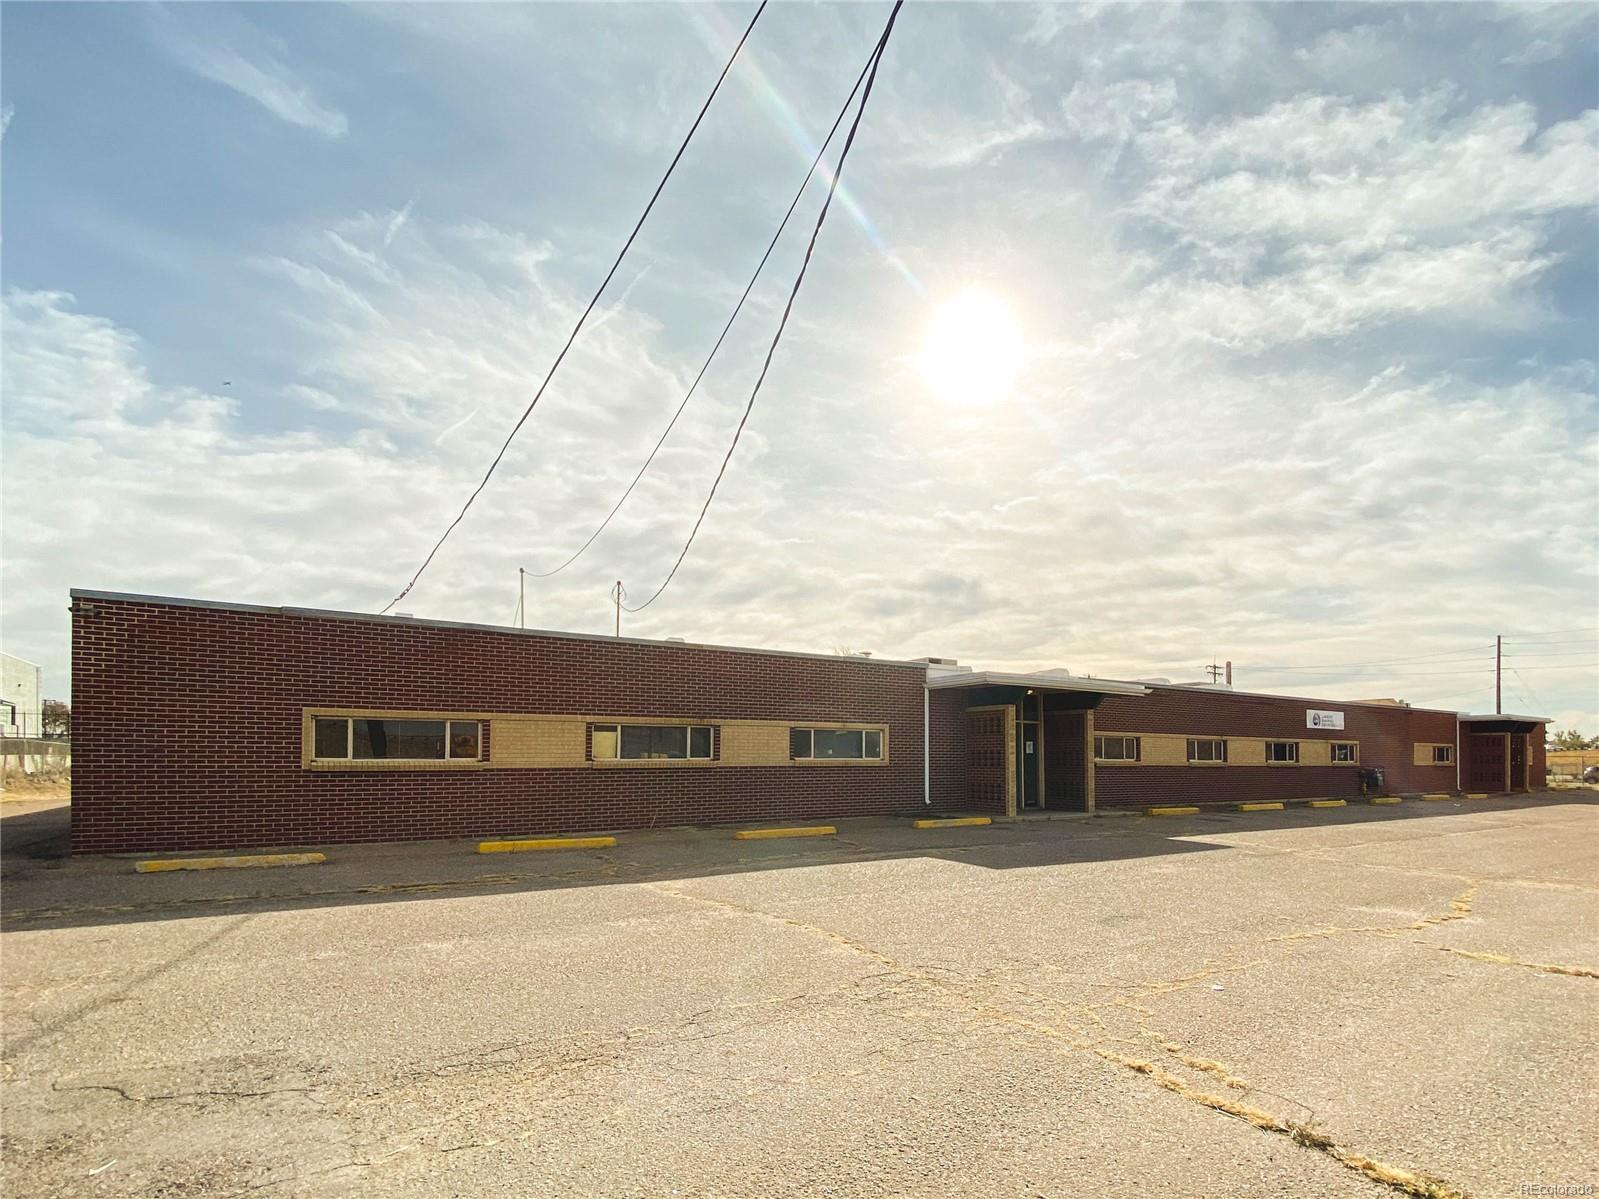 5678 Eudora Street, Commerce City, CO 80022 - Commerce City, CO real estate listing